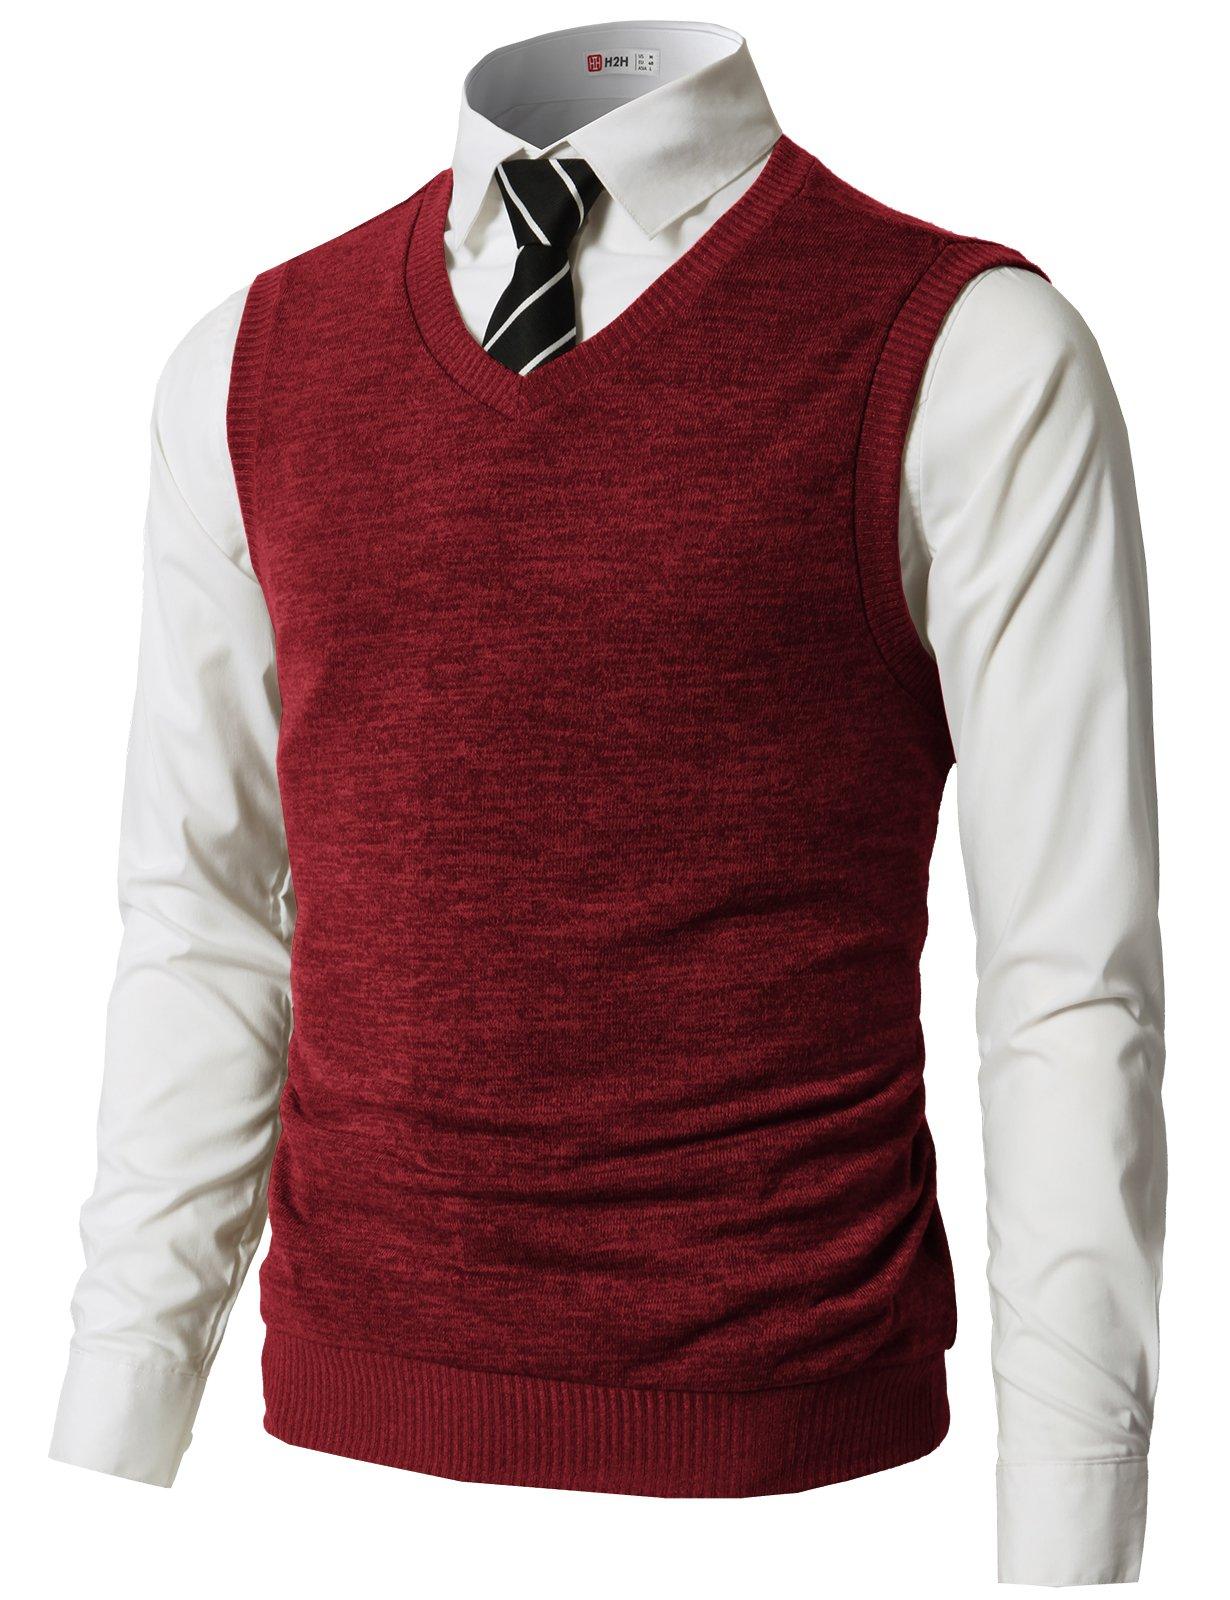 H2H Men's V-Neck Business Gentleman Argyle Pattern Knitted Sweater Vest RED US 3XL/Asia 4XL (CMOV042)